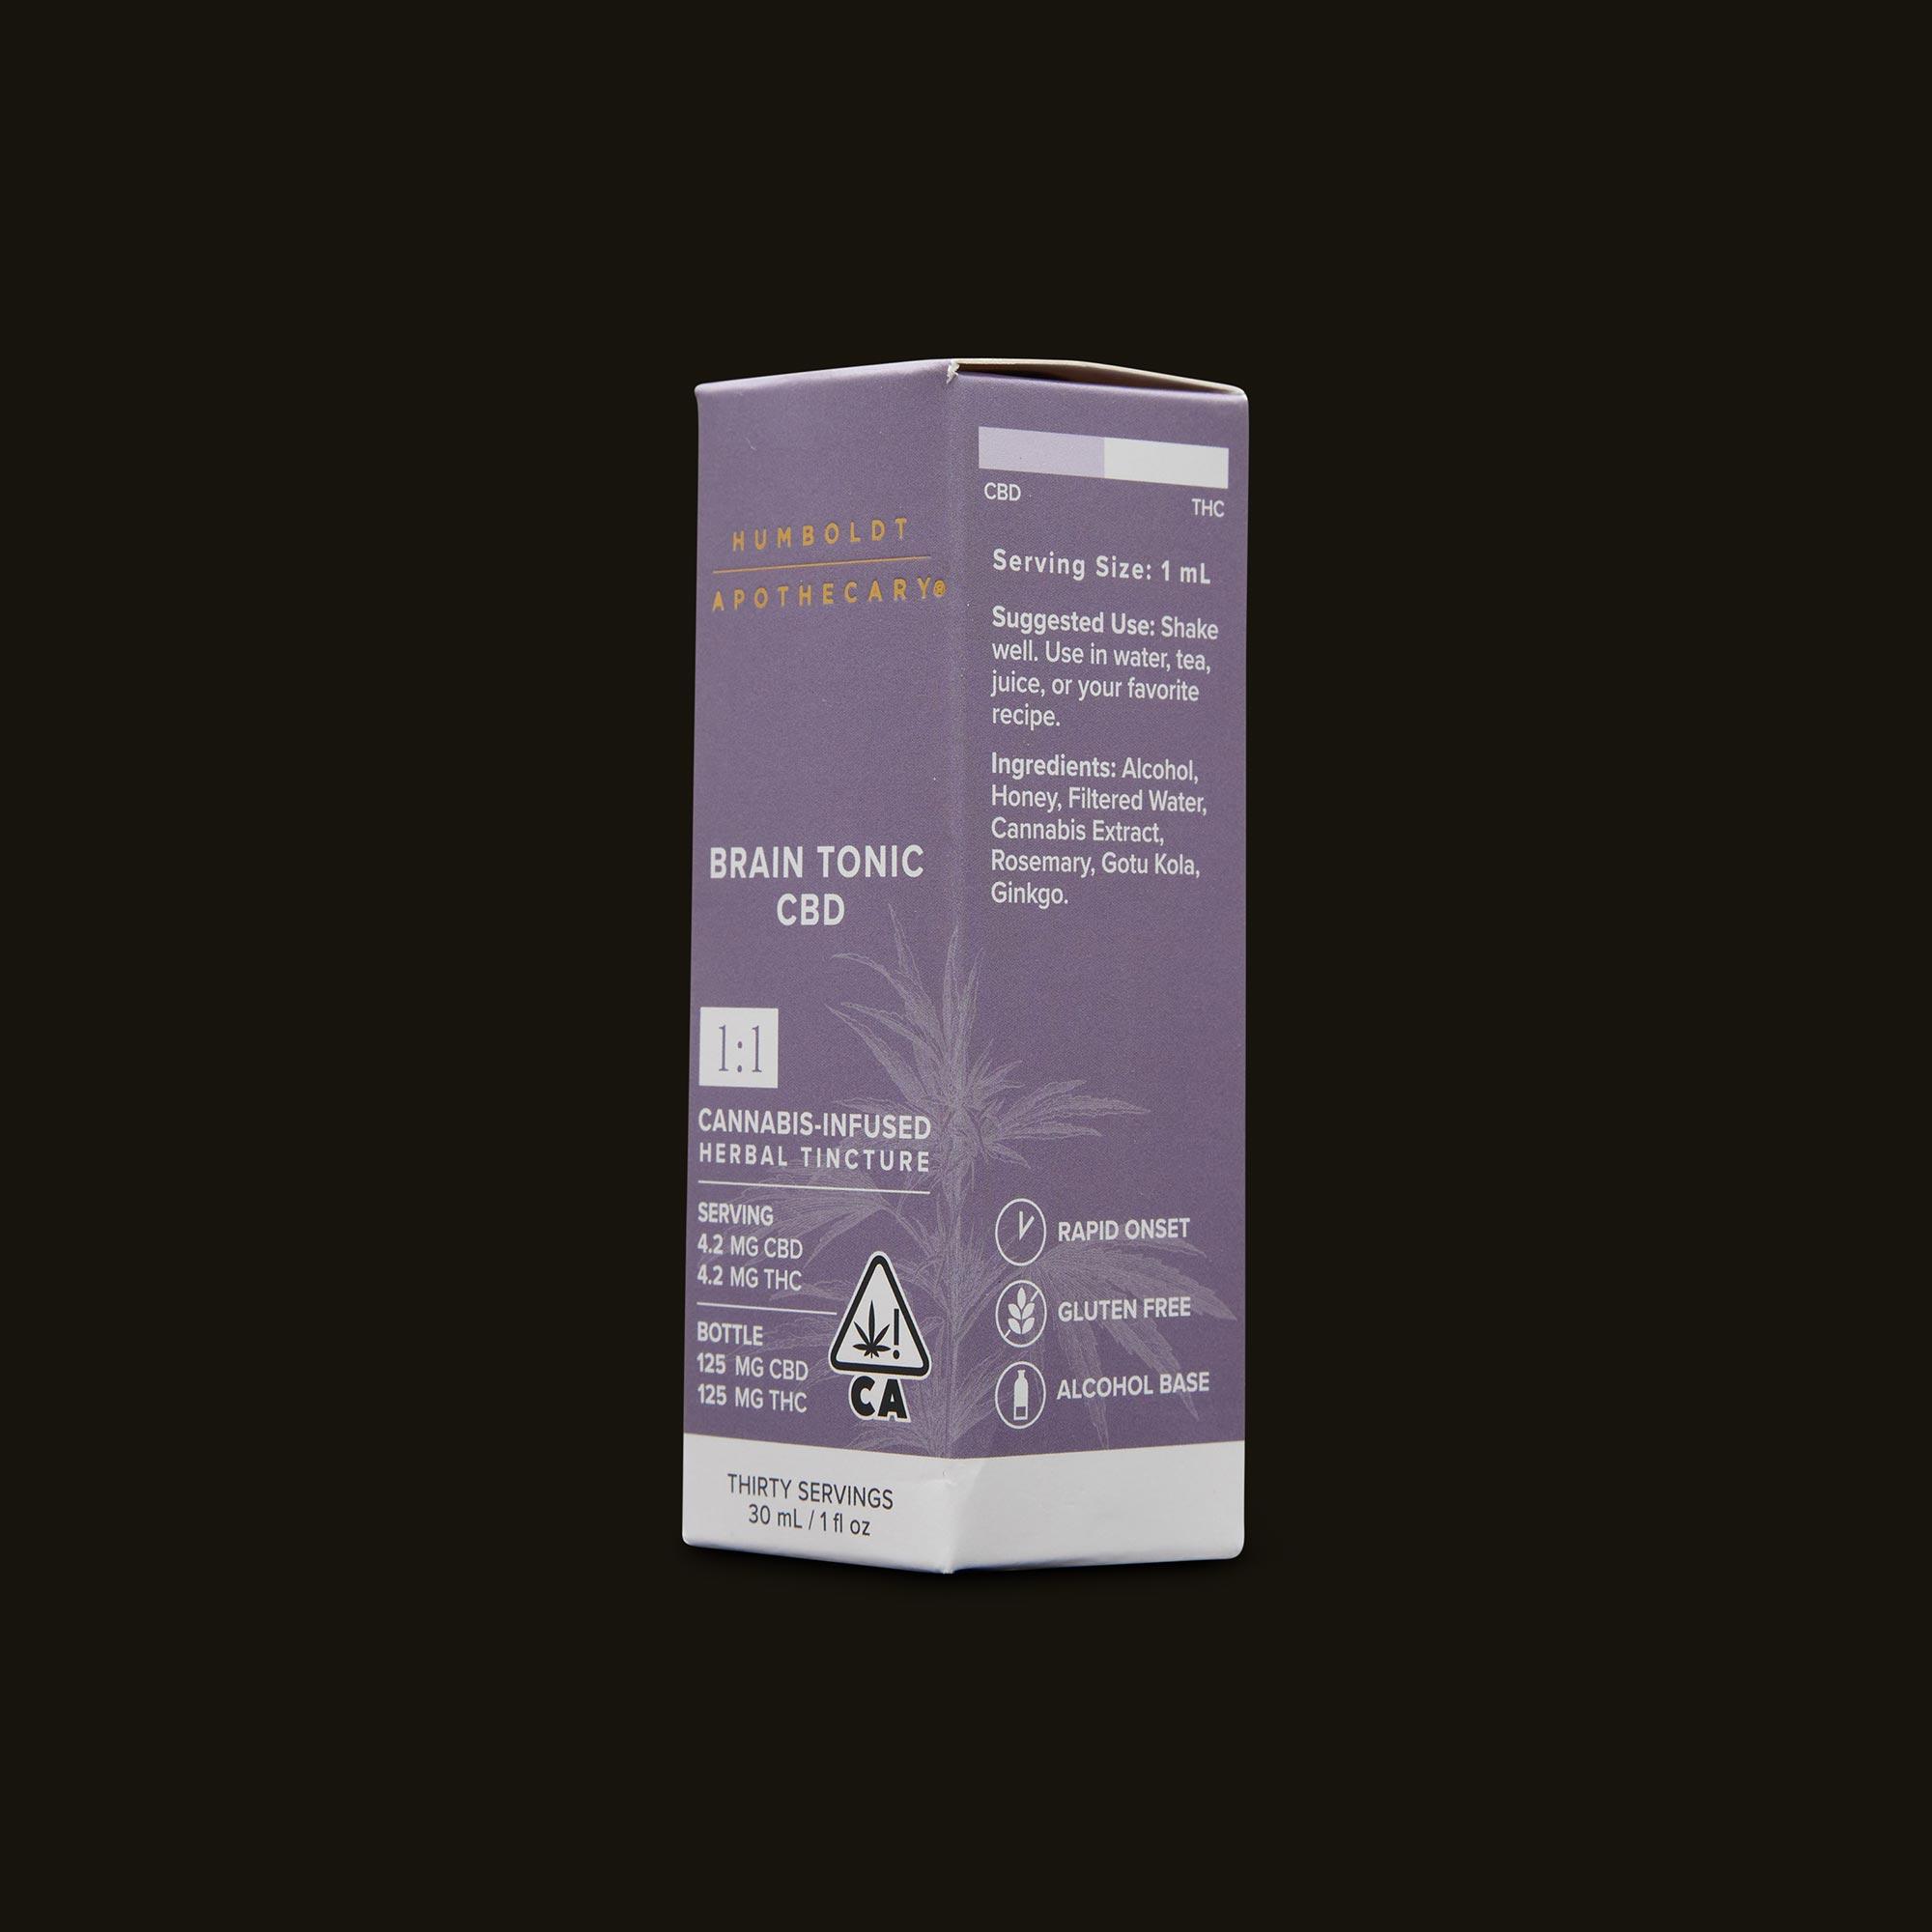 Humboldt Apothecary Brain Tonic CBD 1:1 Ingredients